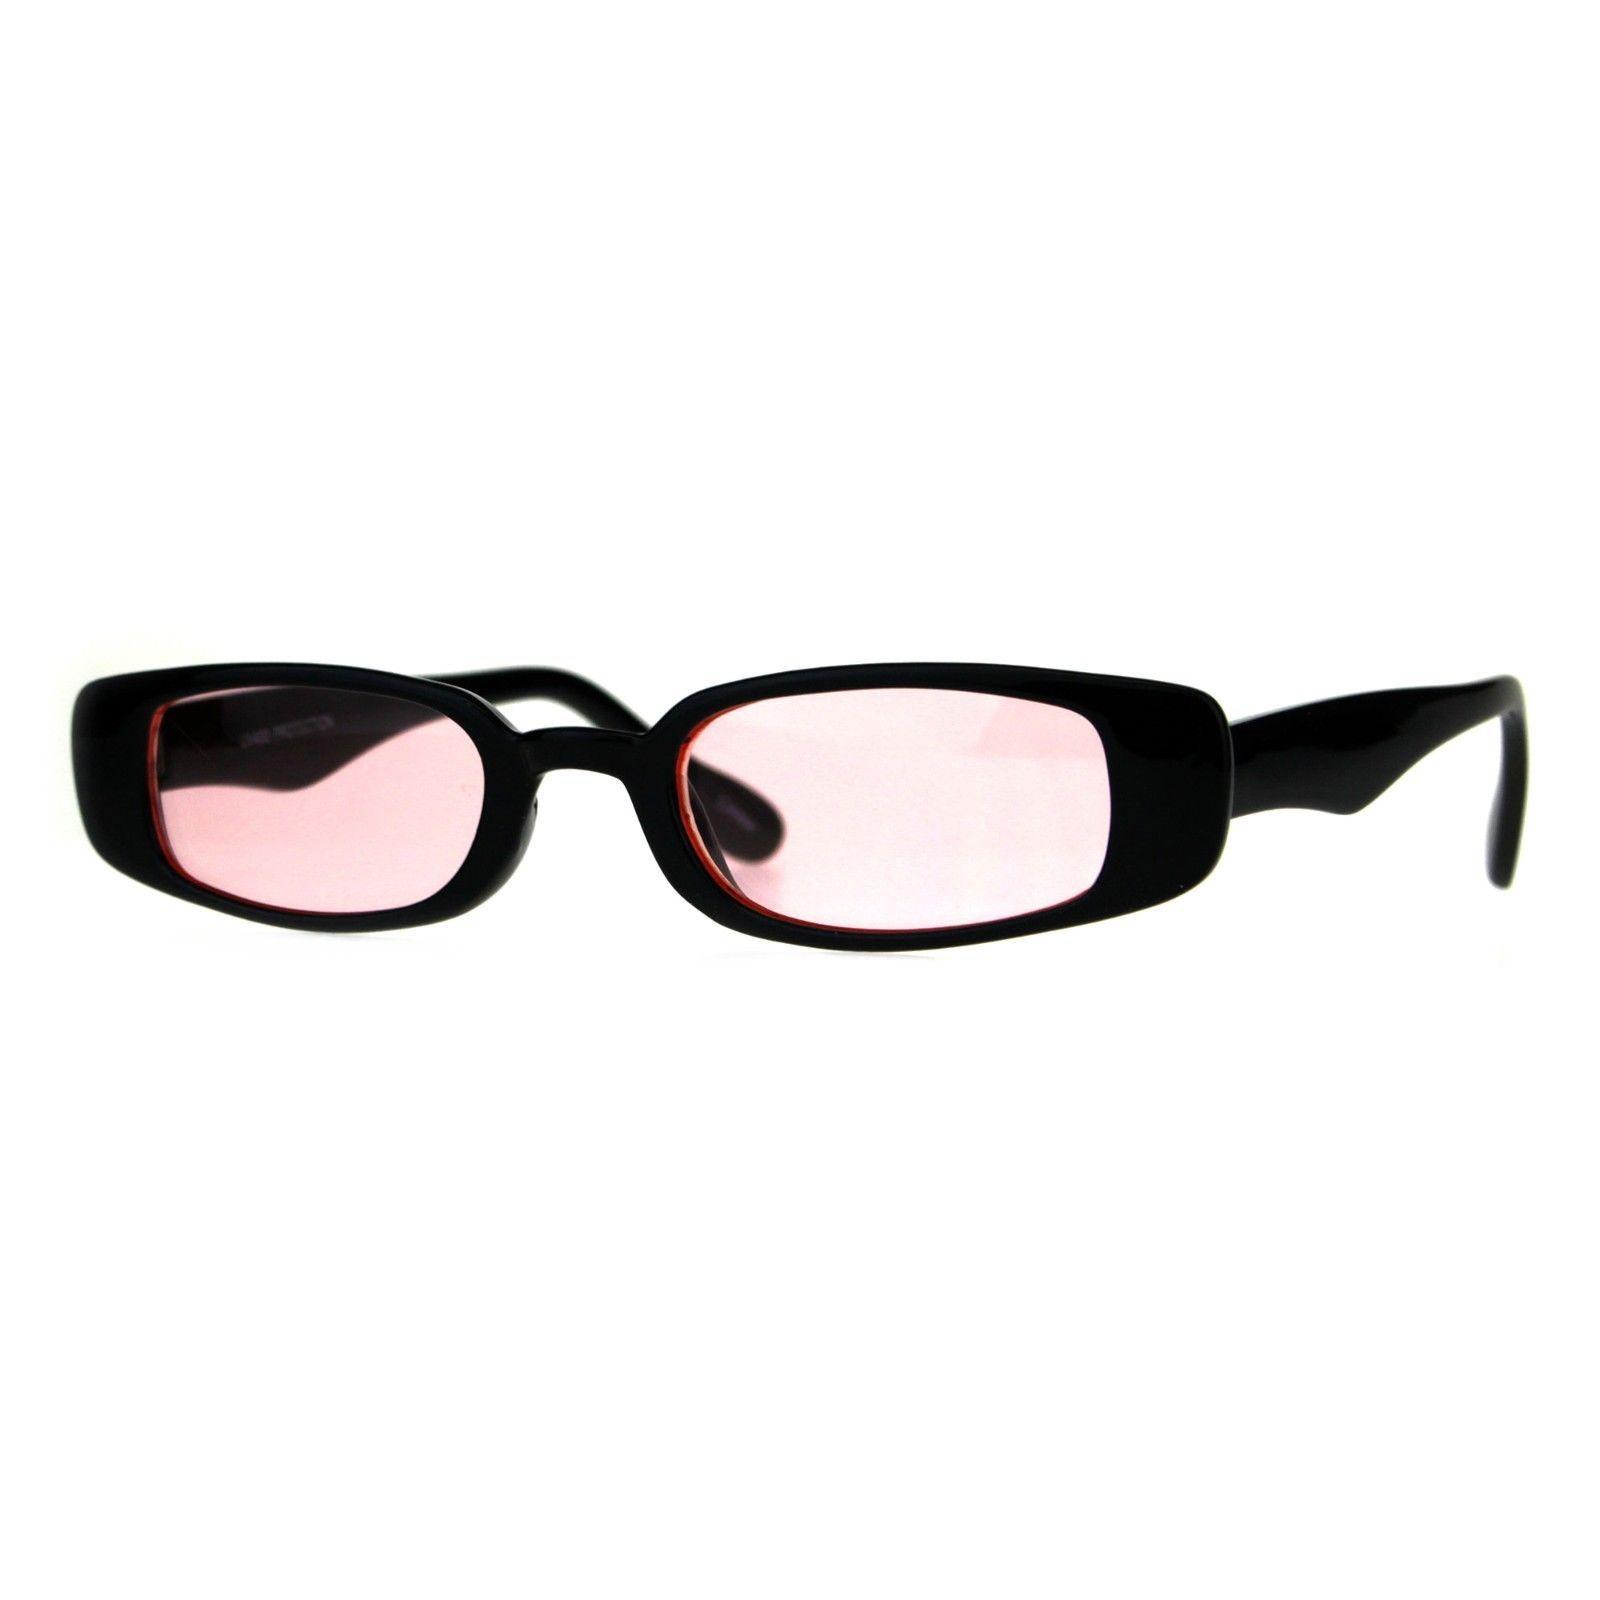 Super Slim Sunglasses Womens Thin Rectangular Black Frame Color Lens UV 400